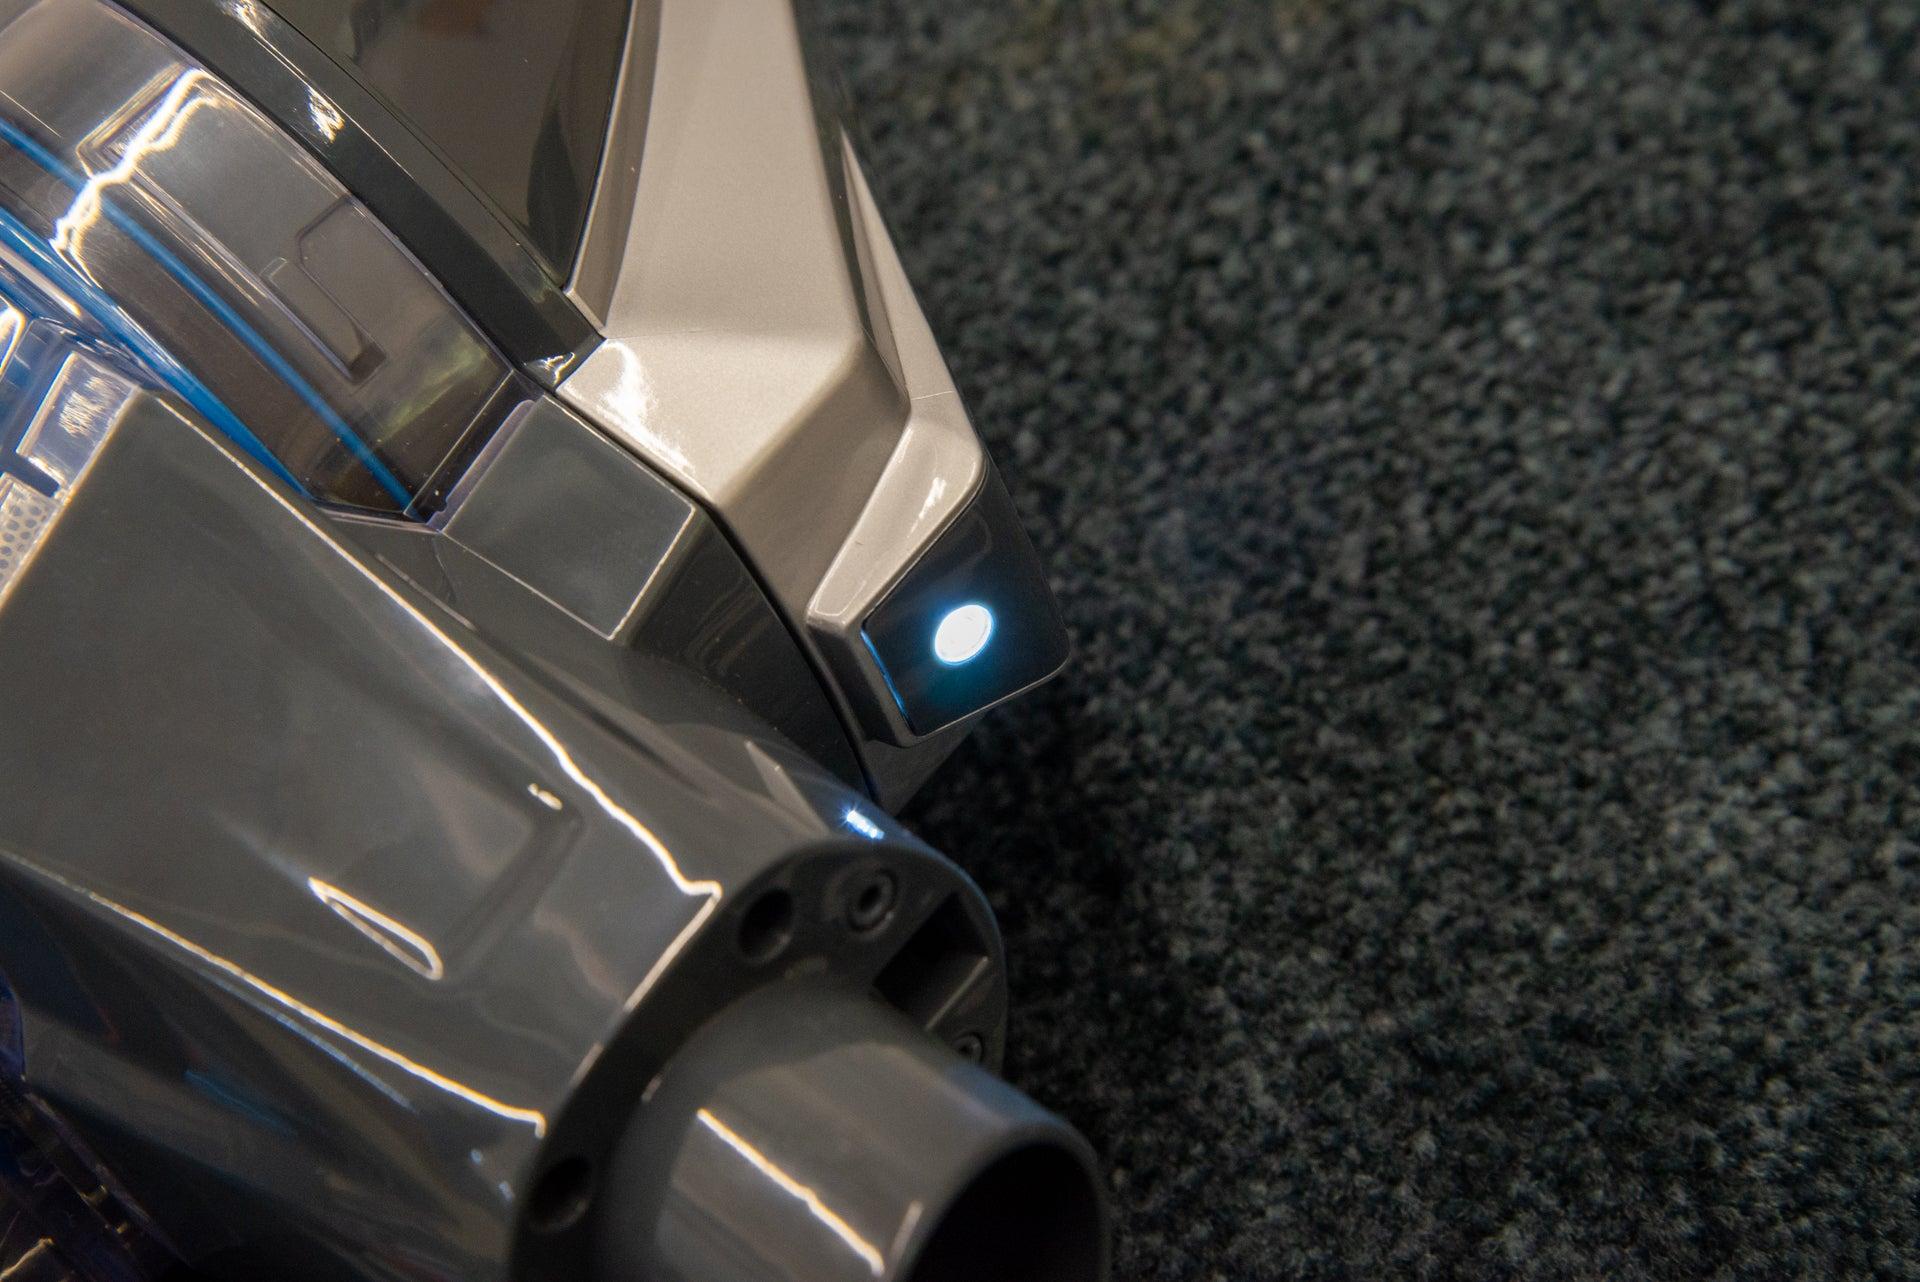 Hoover H-Free 300 LED on main vacuu